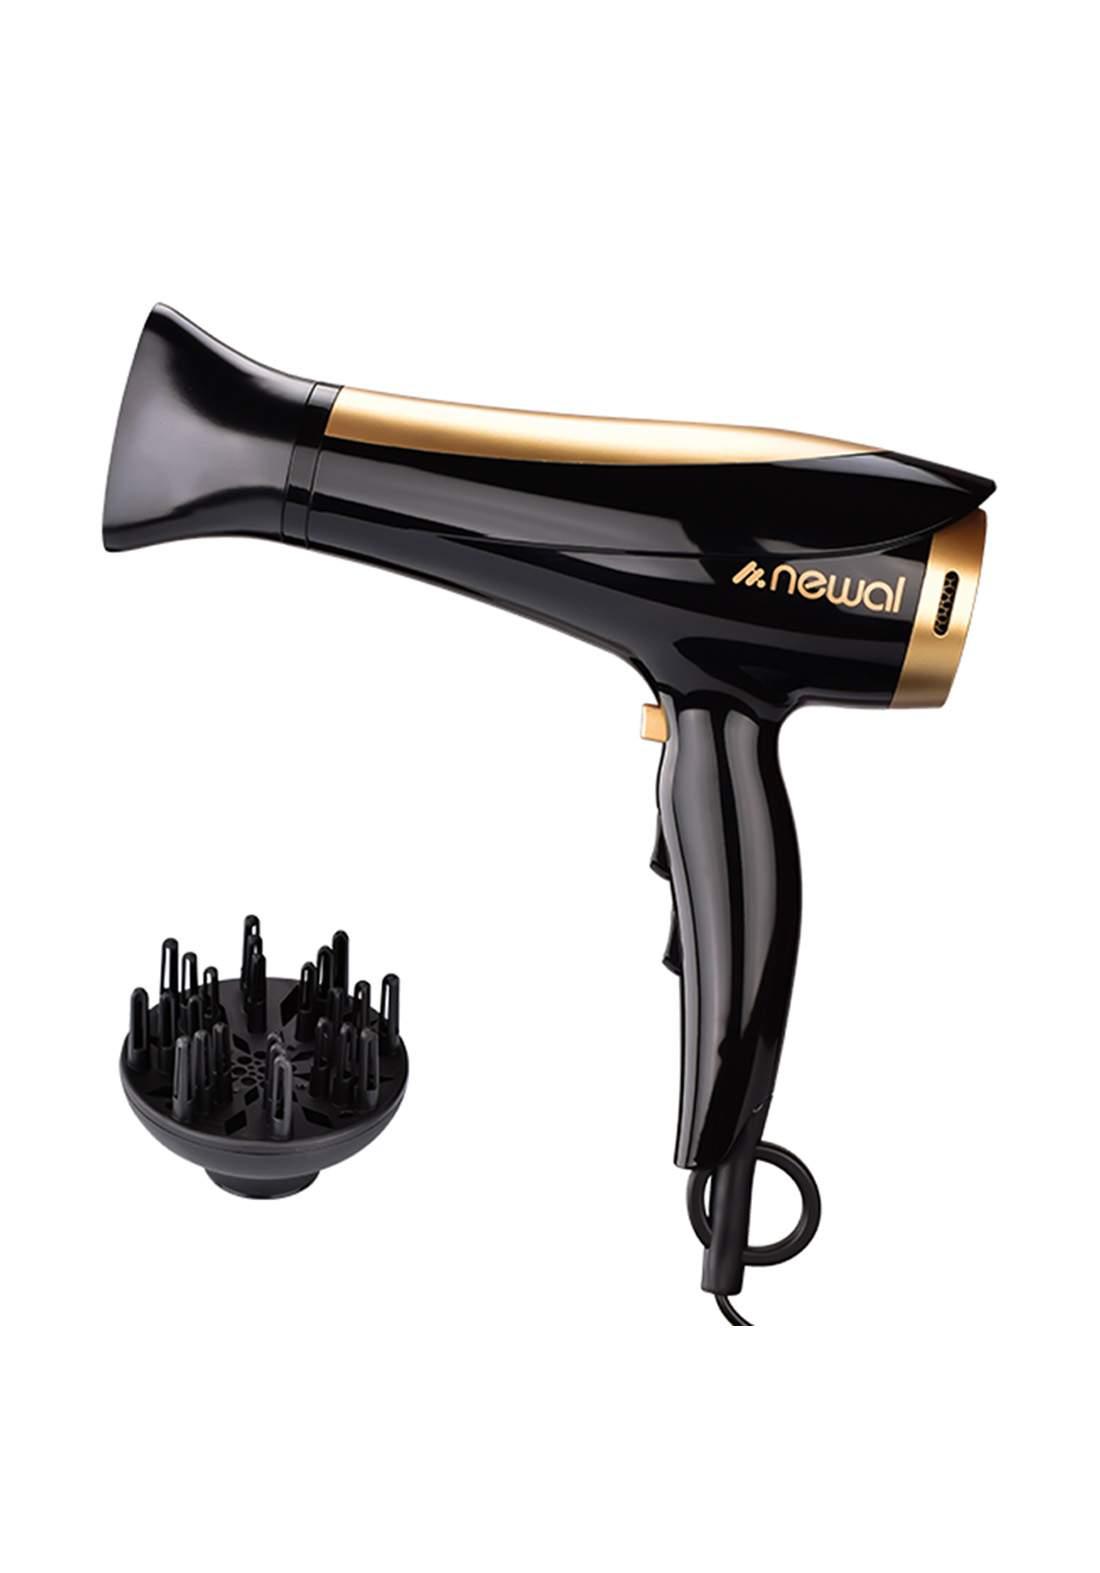 Newal HDR-596 Hair Dryer مجفف الشعر